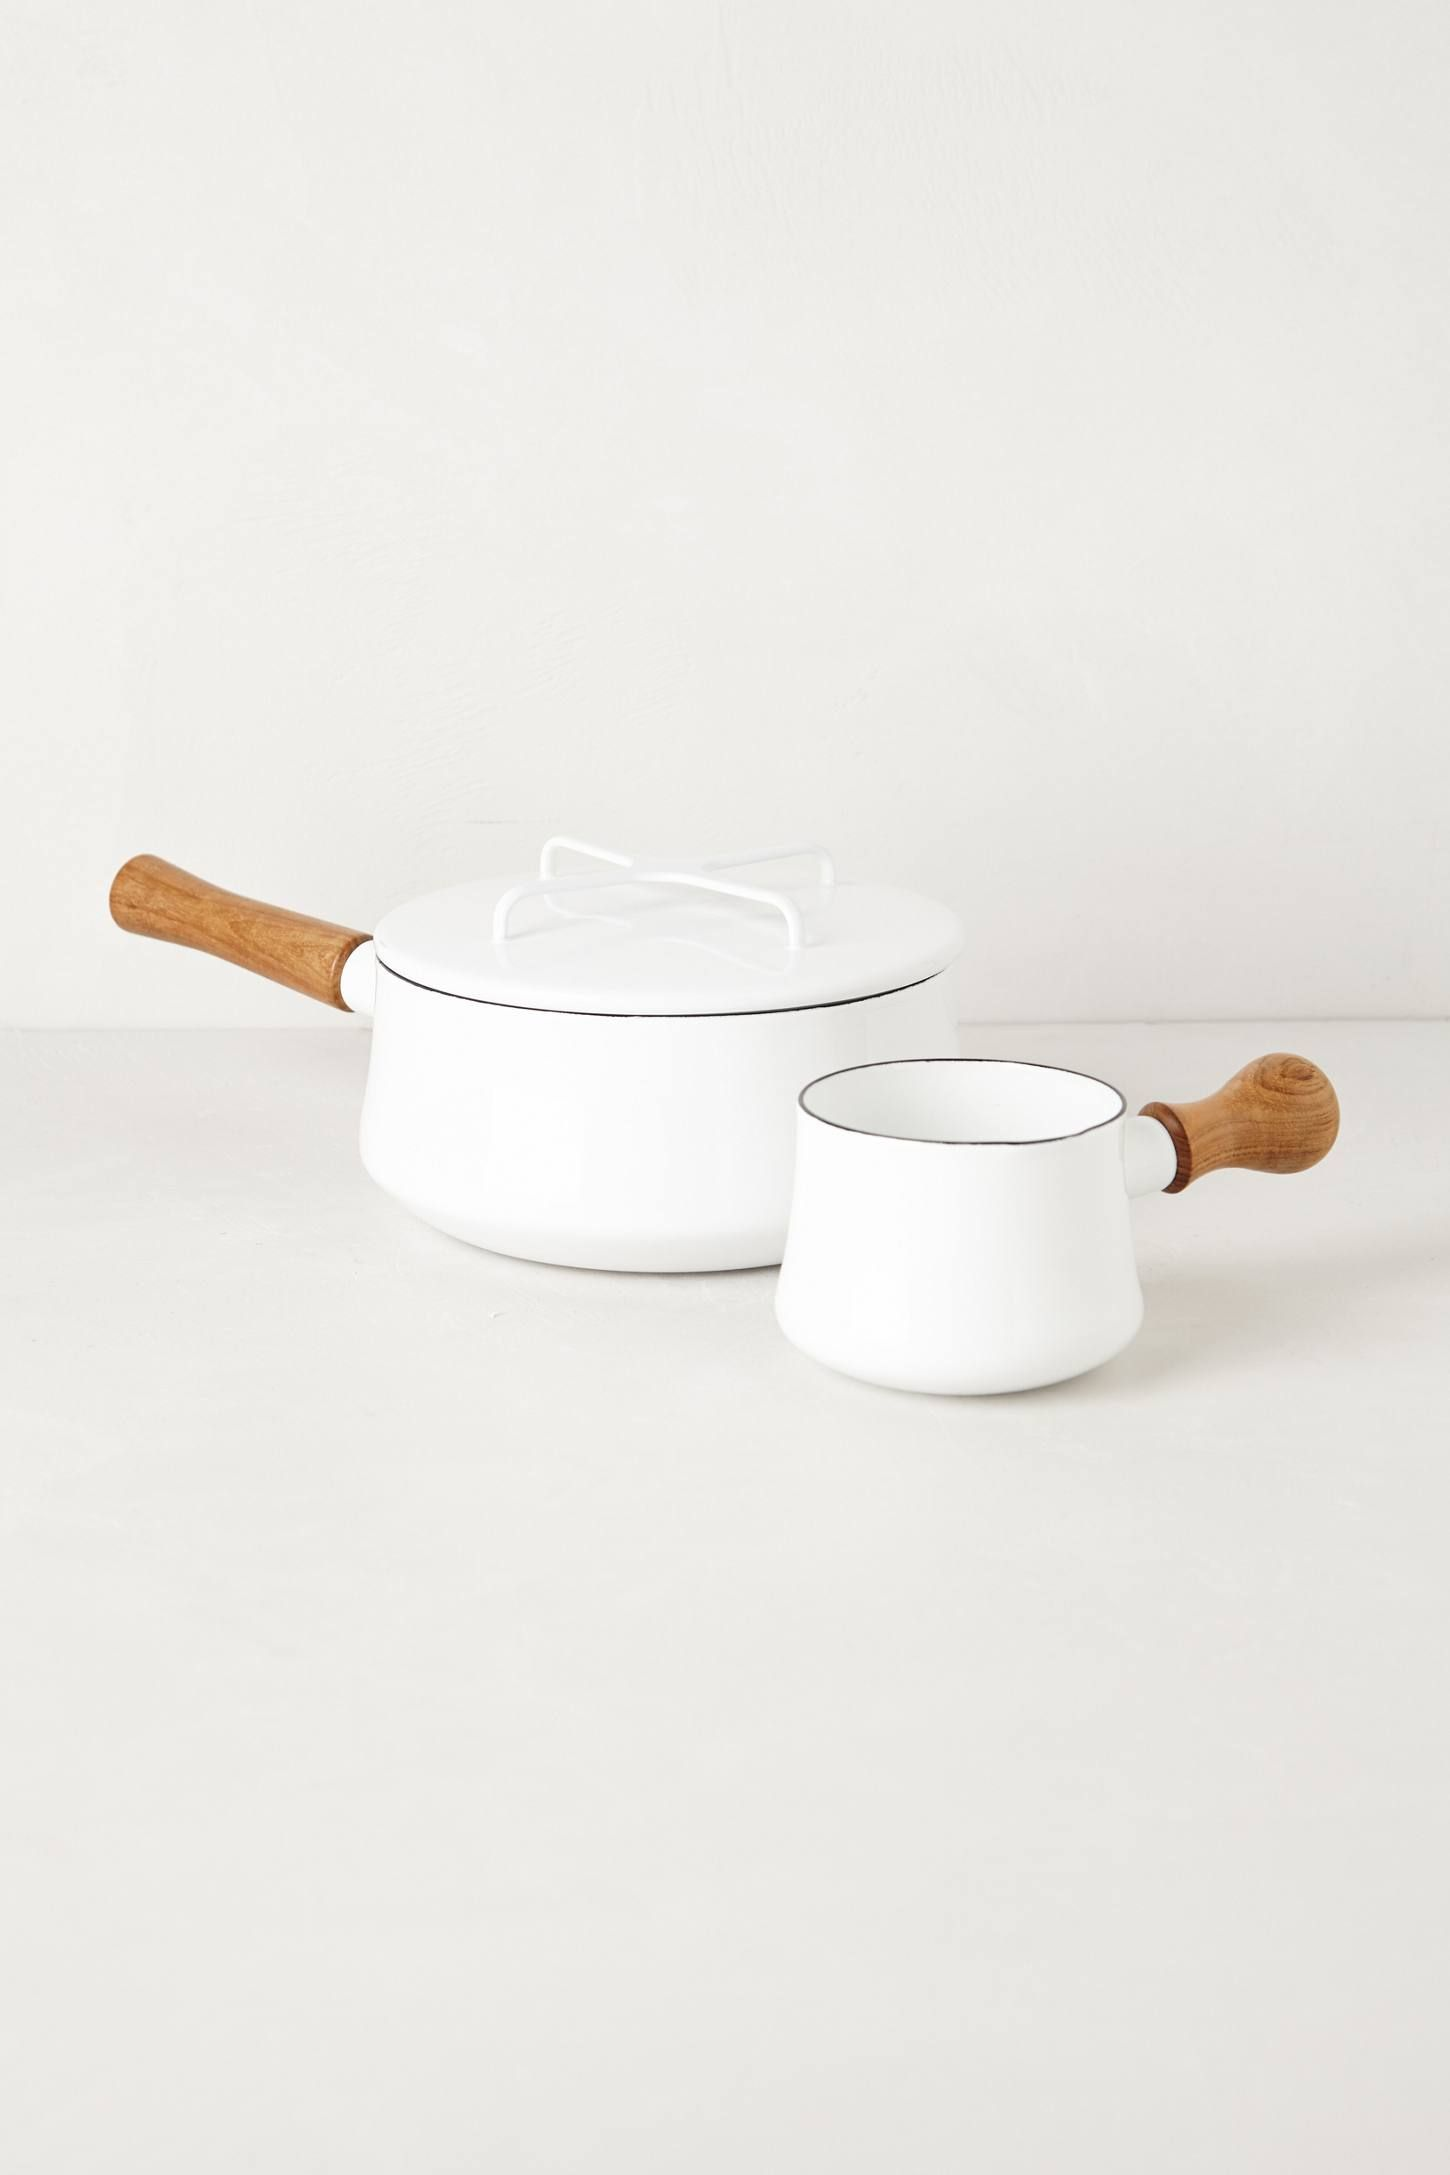 anthro . dansk - kobenstyle cookware